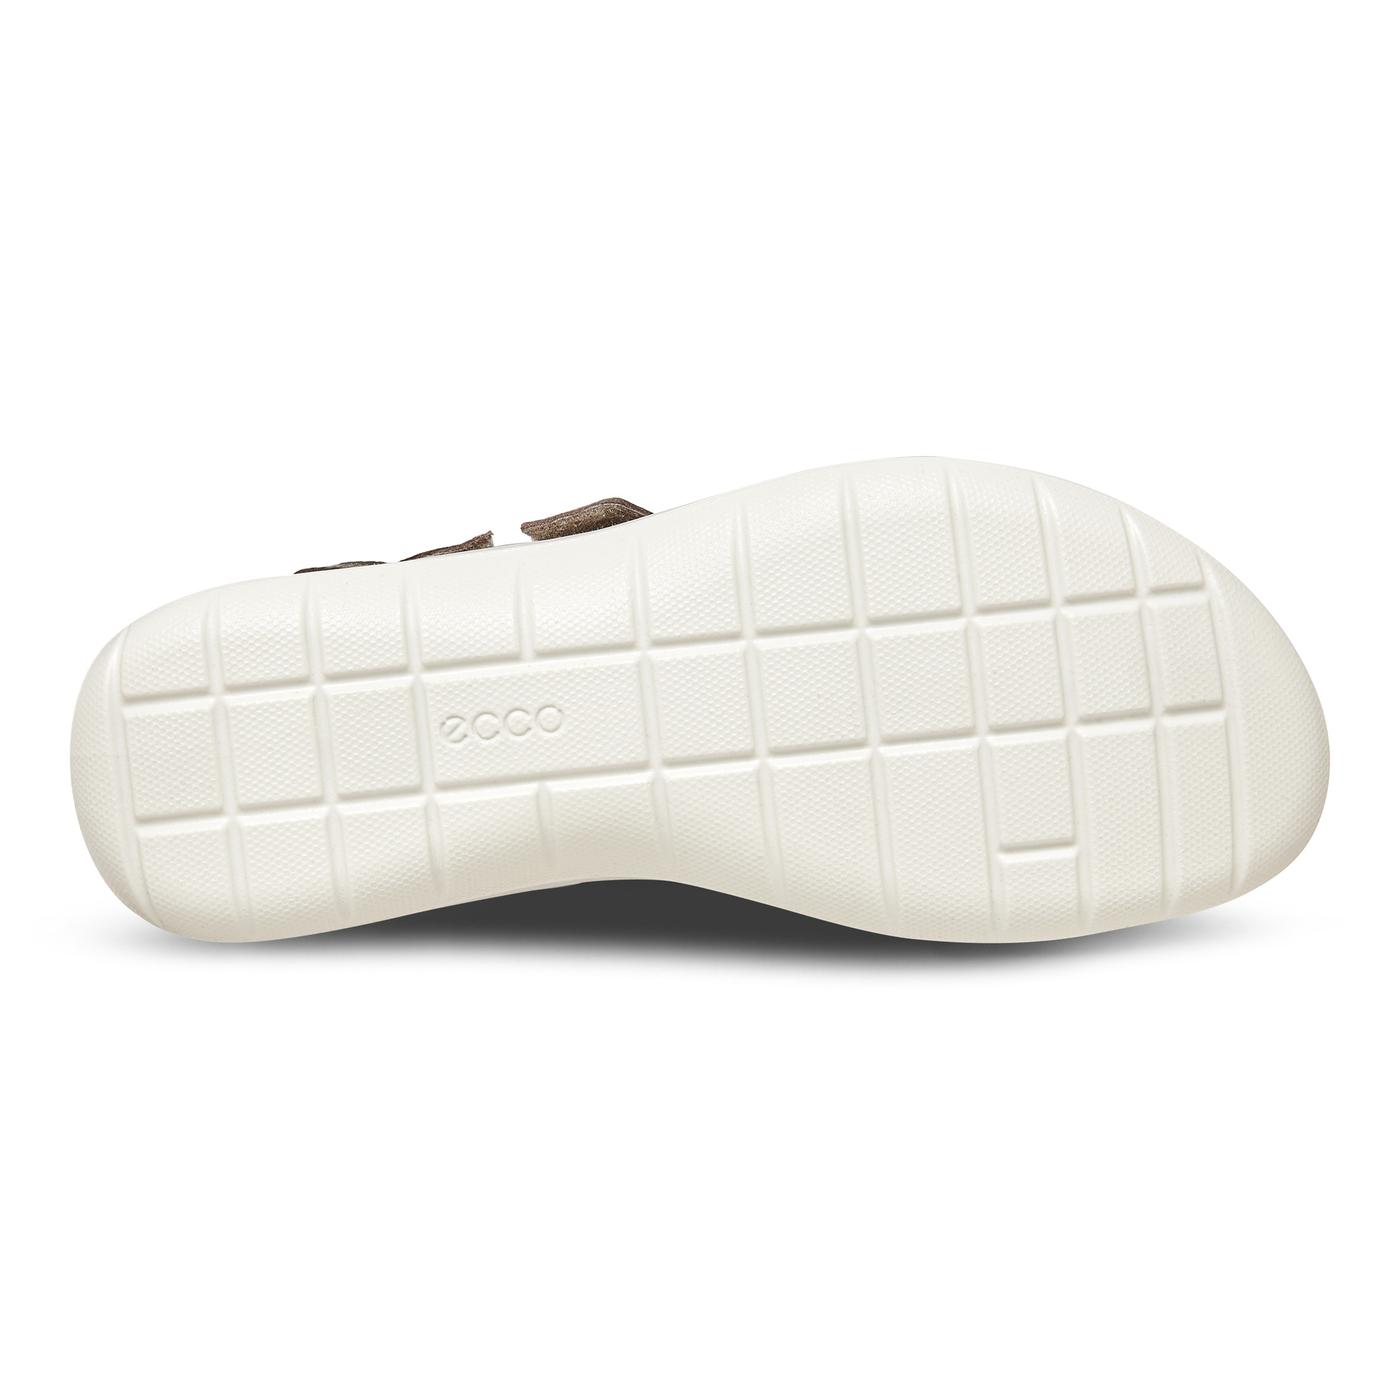 ECCO SOFT5 3-Strap Sandal